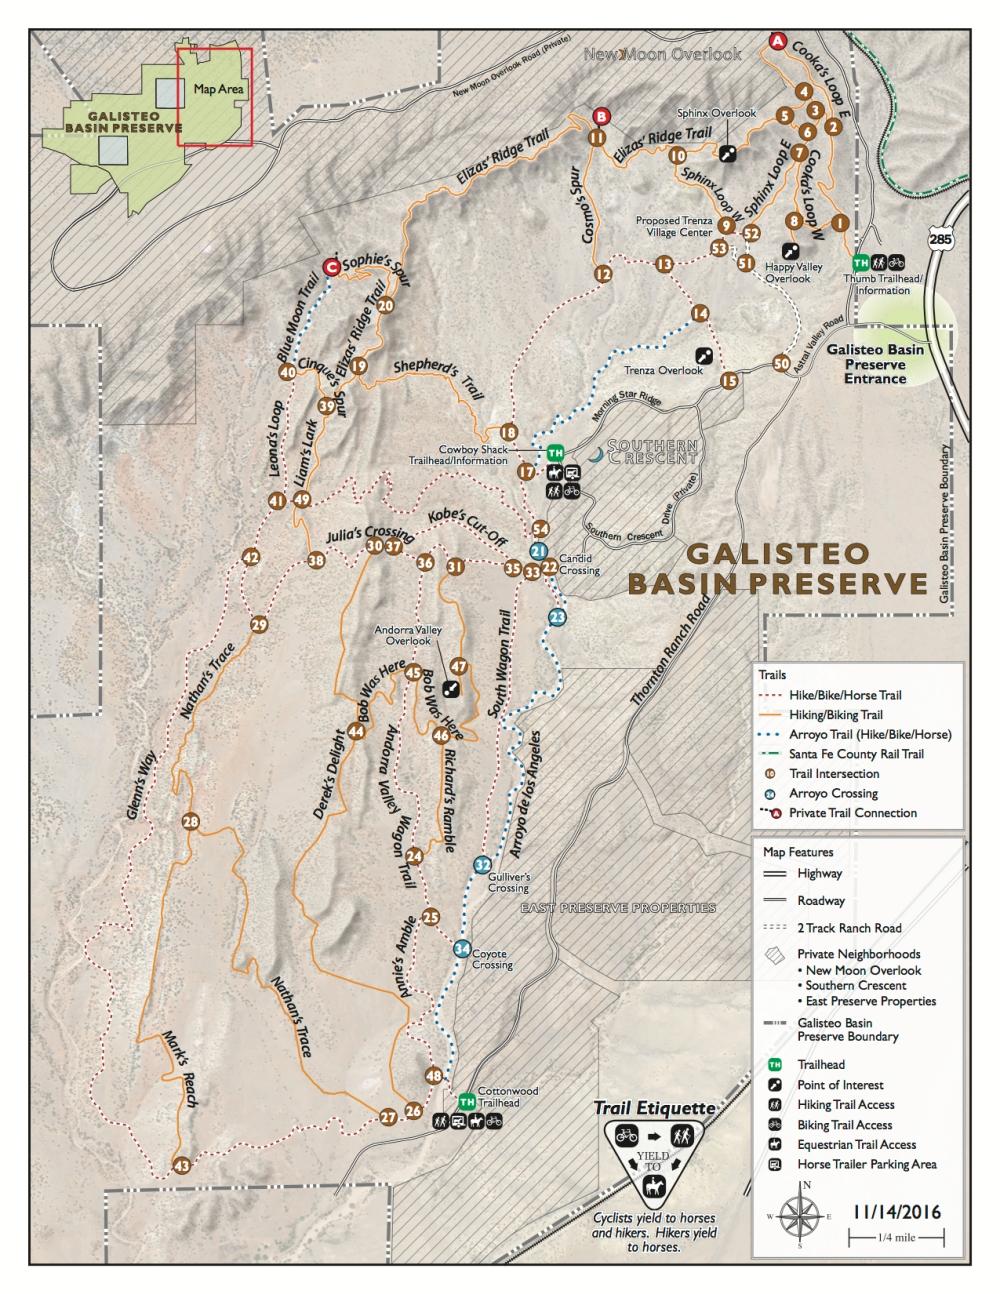 gbp-trails-map2016